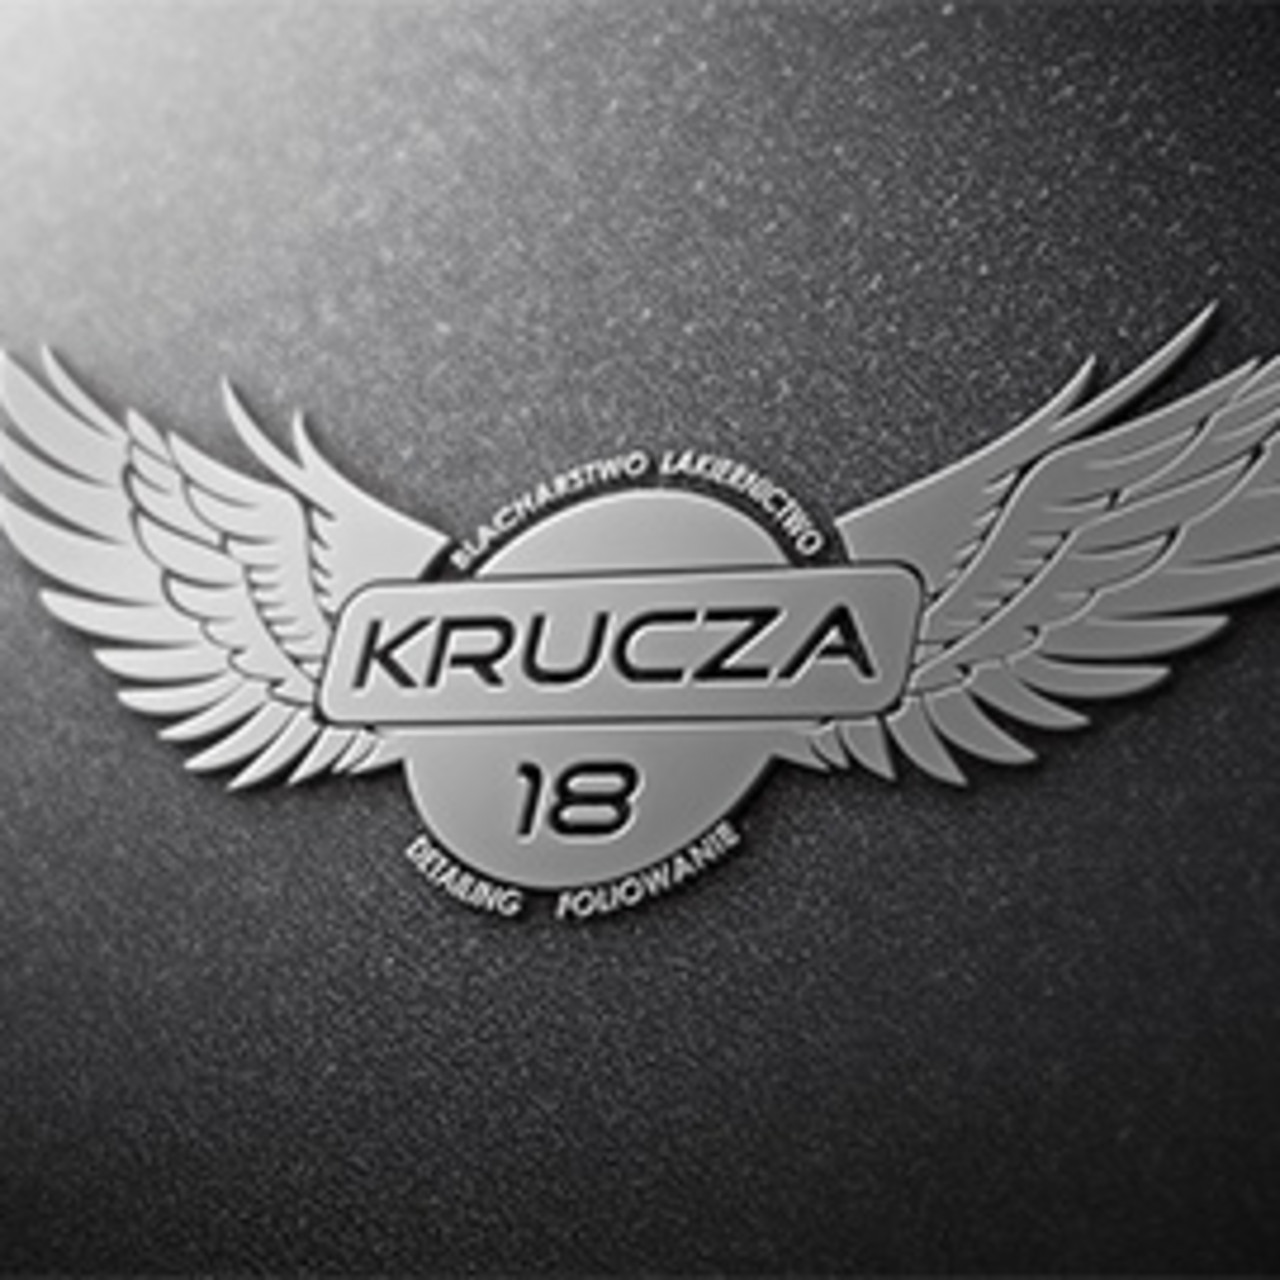 krucza18_showroom.jpg